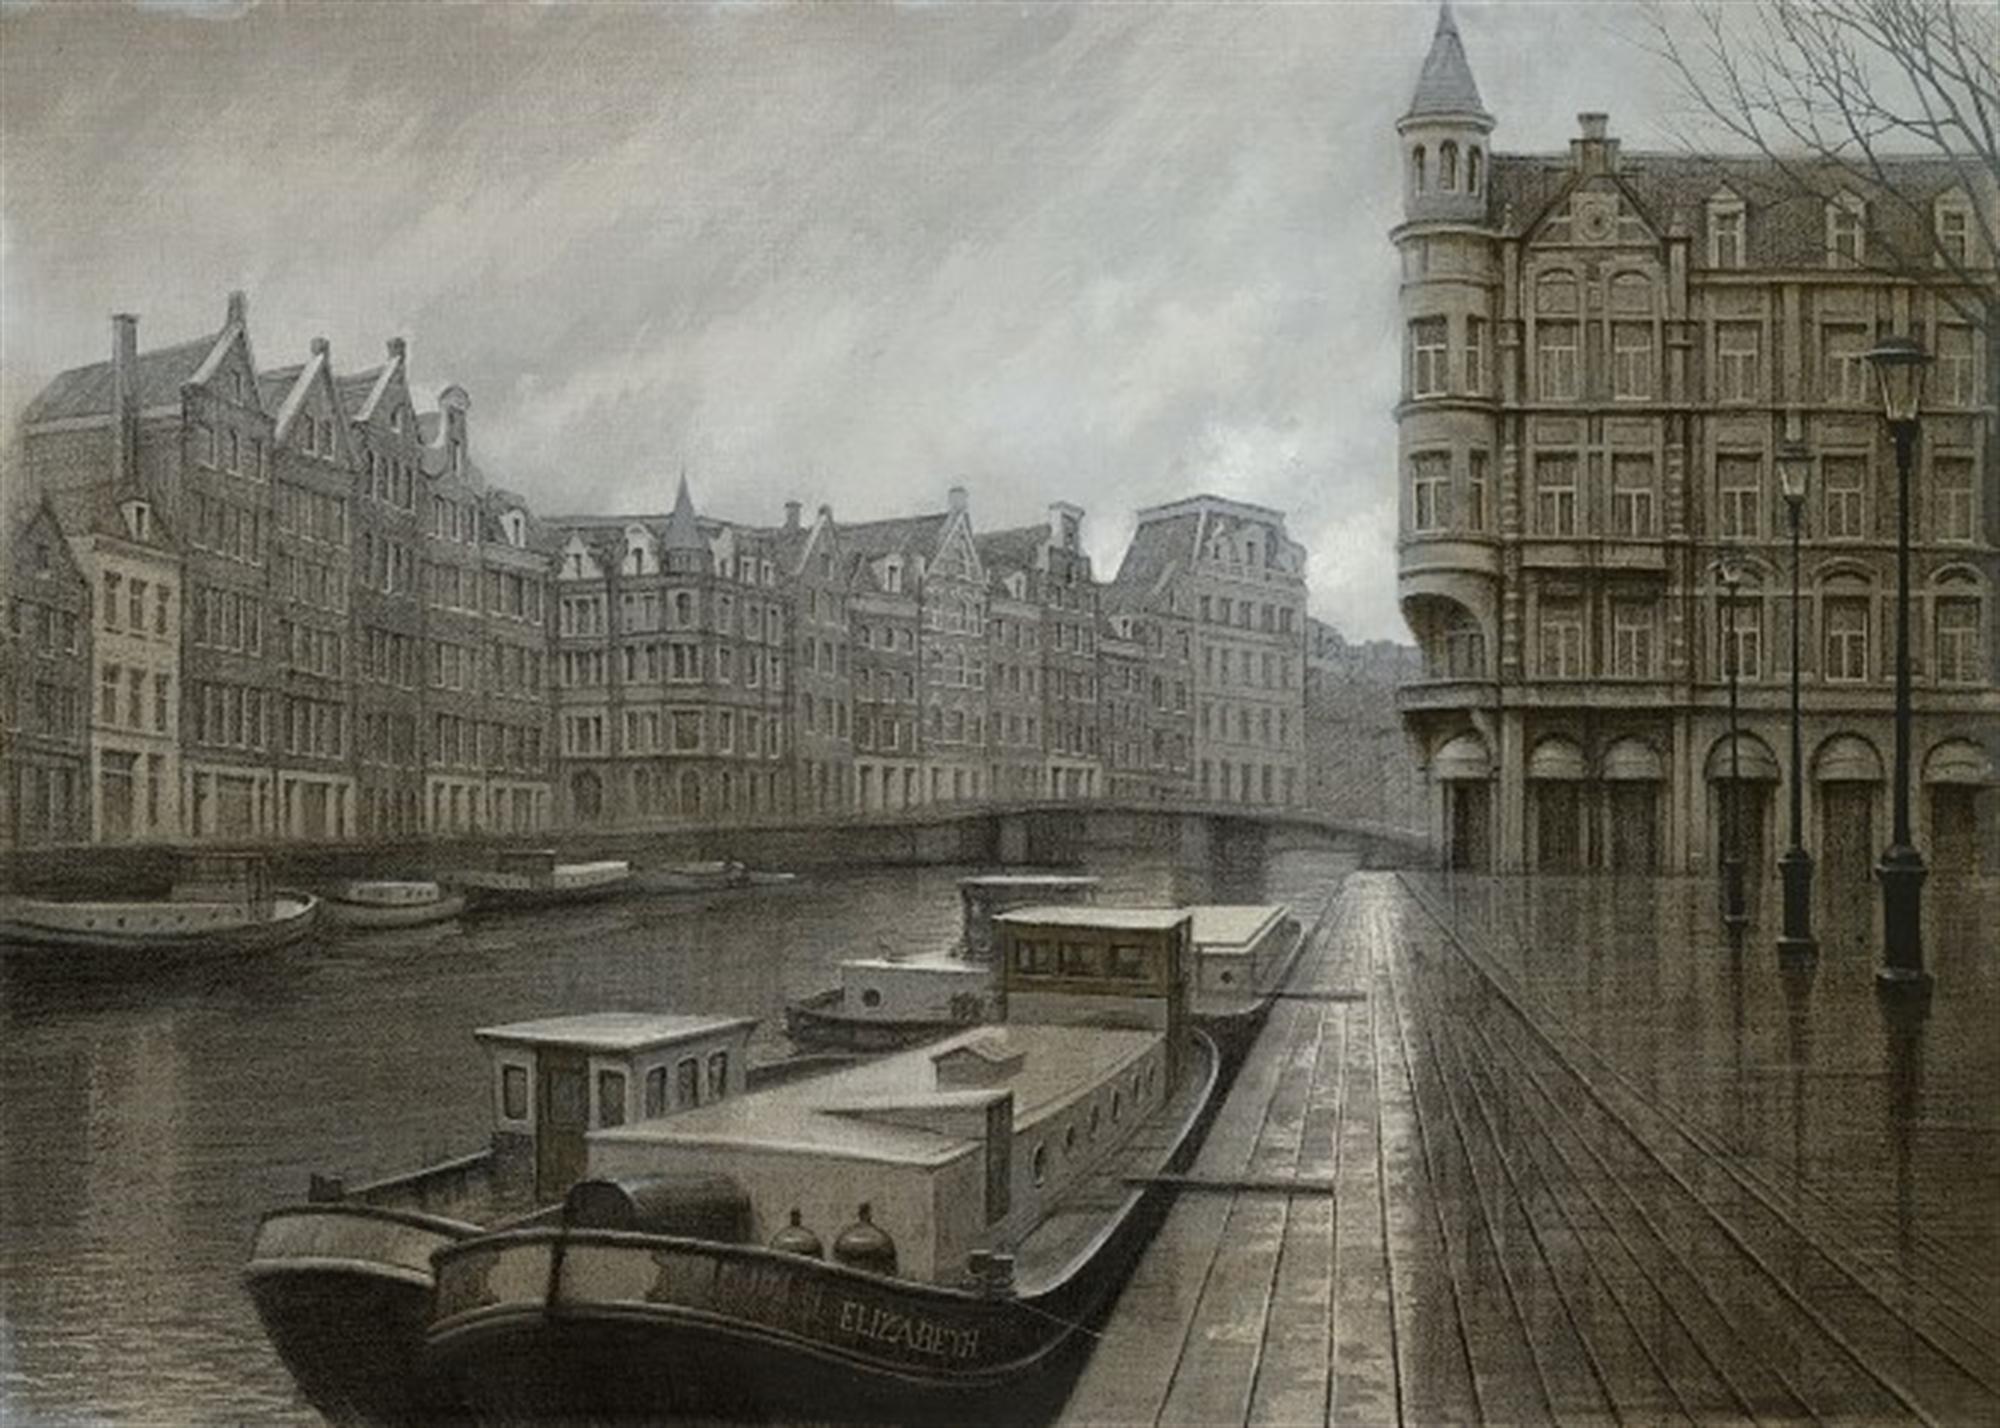 A Frosty Morning - Amsterdam by Alexei Butirskiy